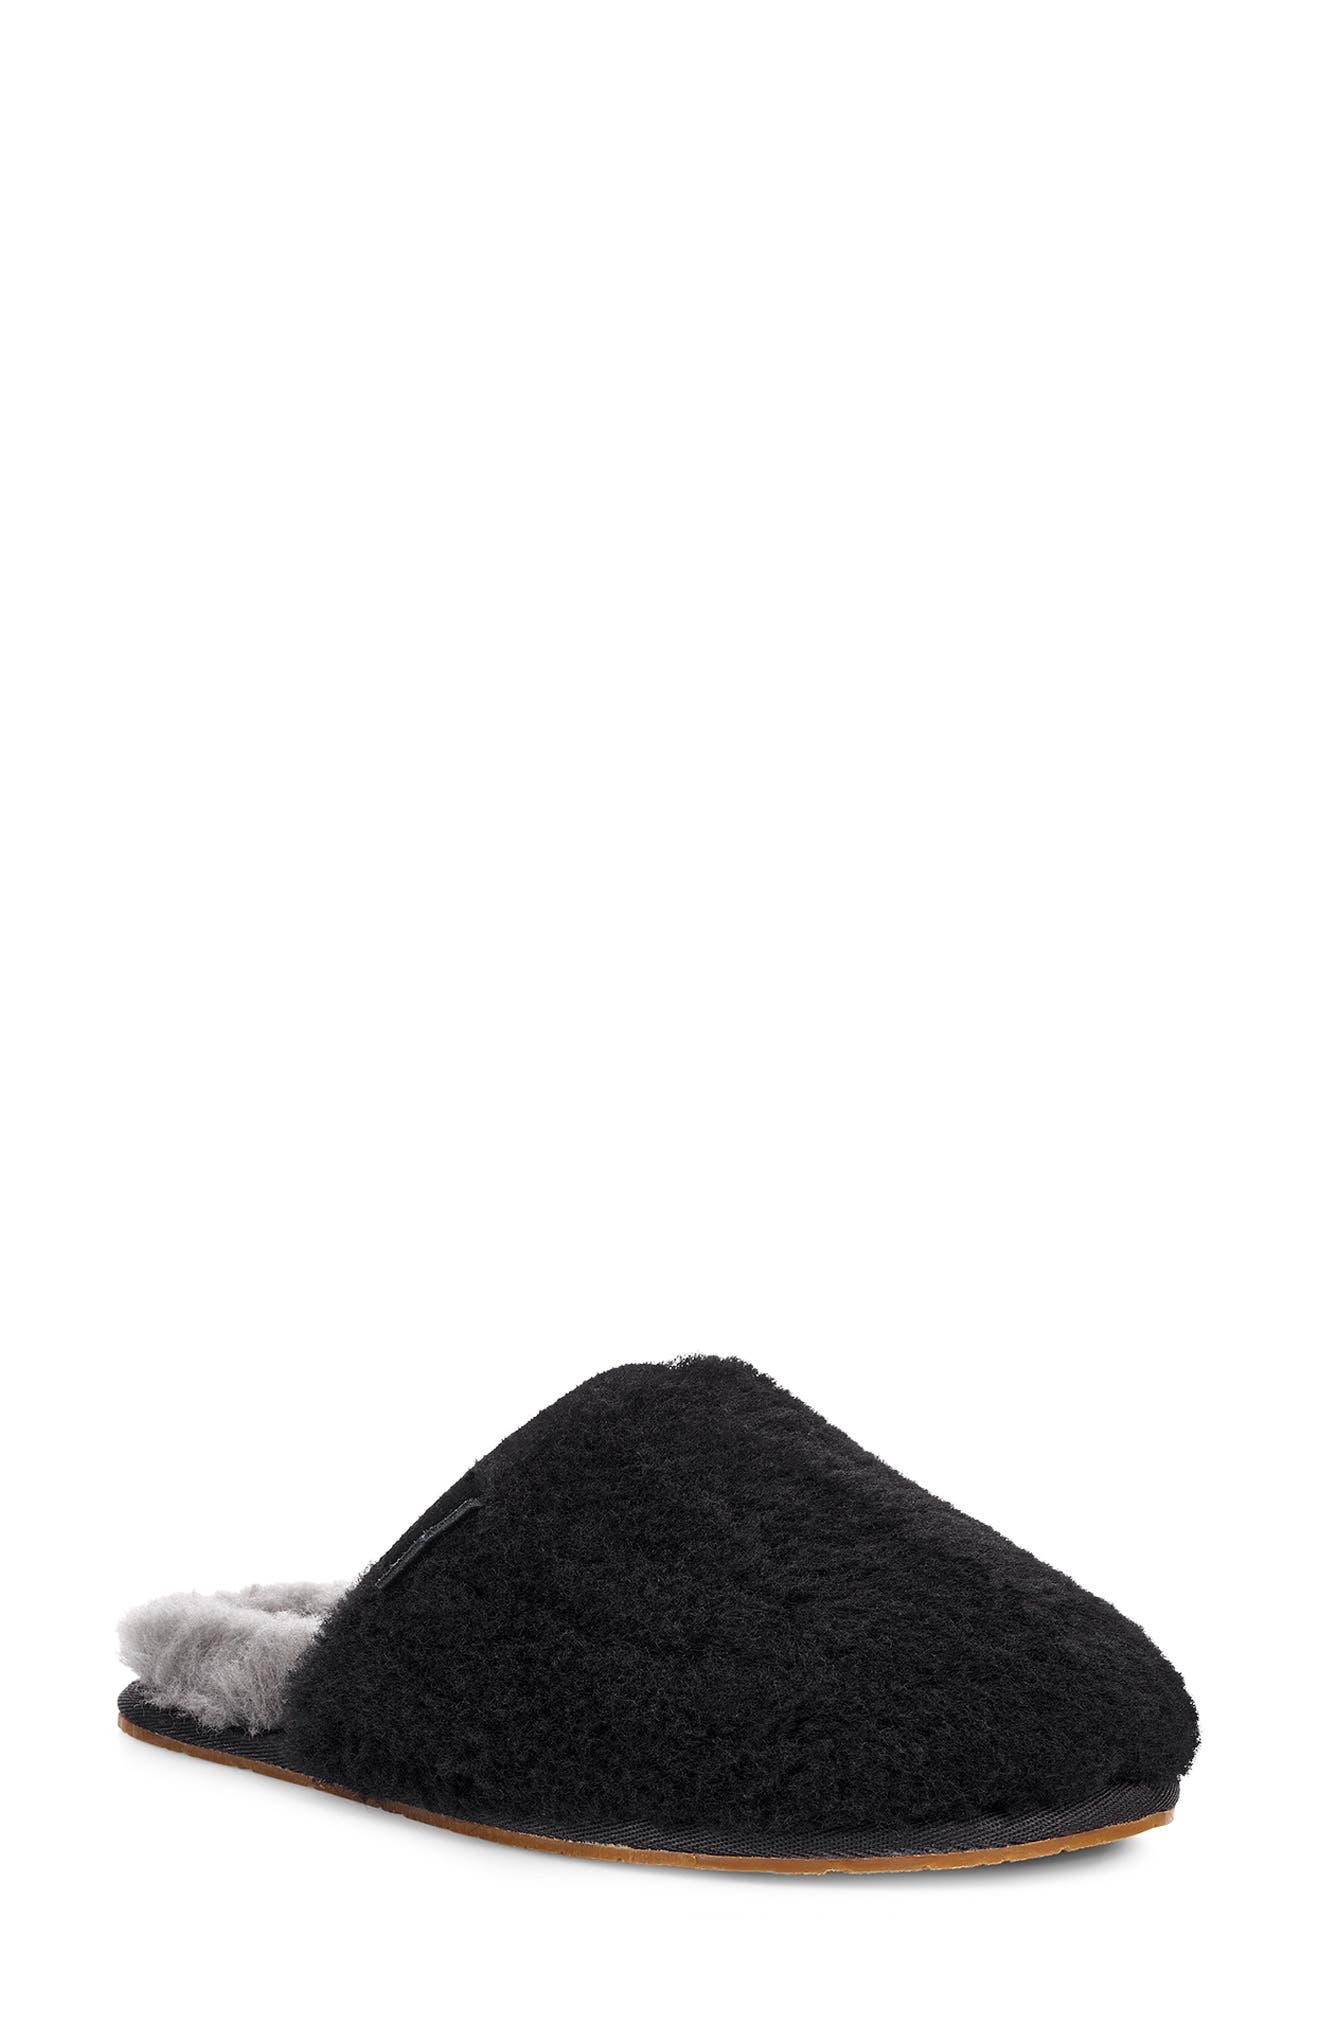 UGG<SUP>®</SUP>, Fluffette Slipper, Main thumbnail 1, color, BLACK WOOL